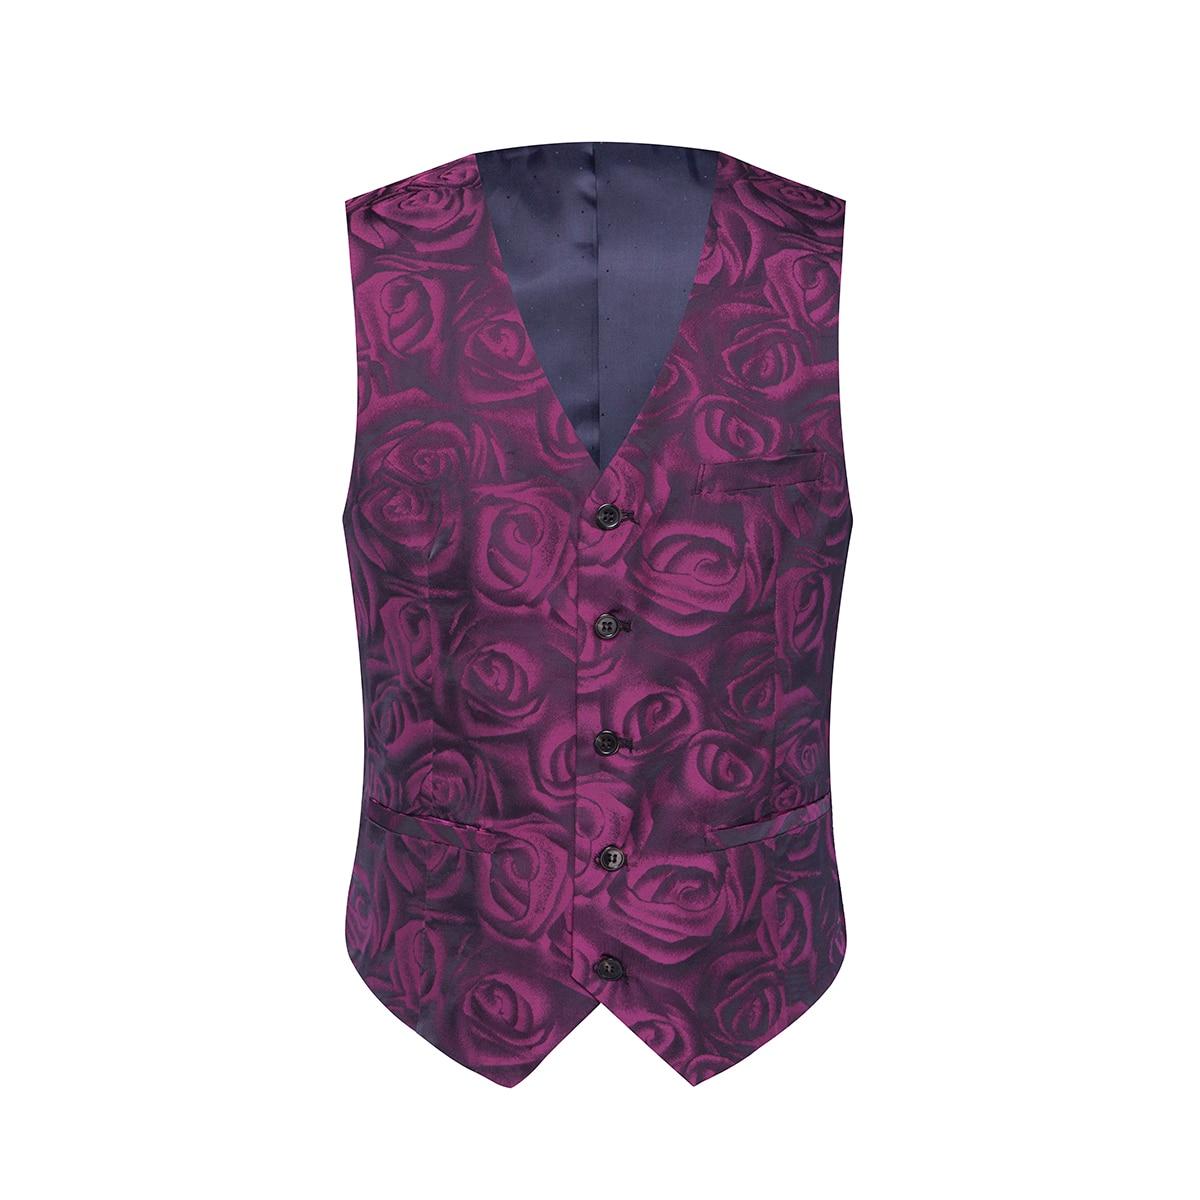 YUNCLOS Rose Printed Men Suit Fashion Party Wedding Suit For Men 3 Pieces Slim Fit Gentleman Suits Terno Masculino